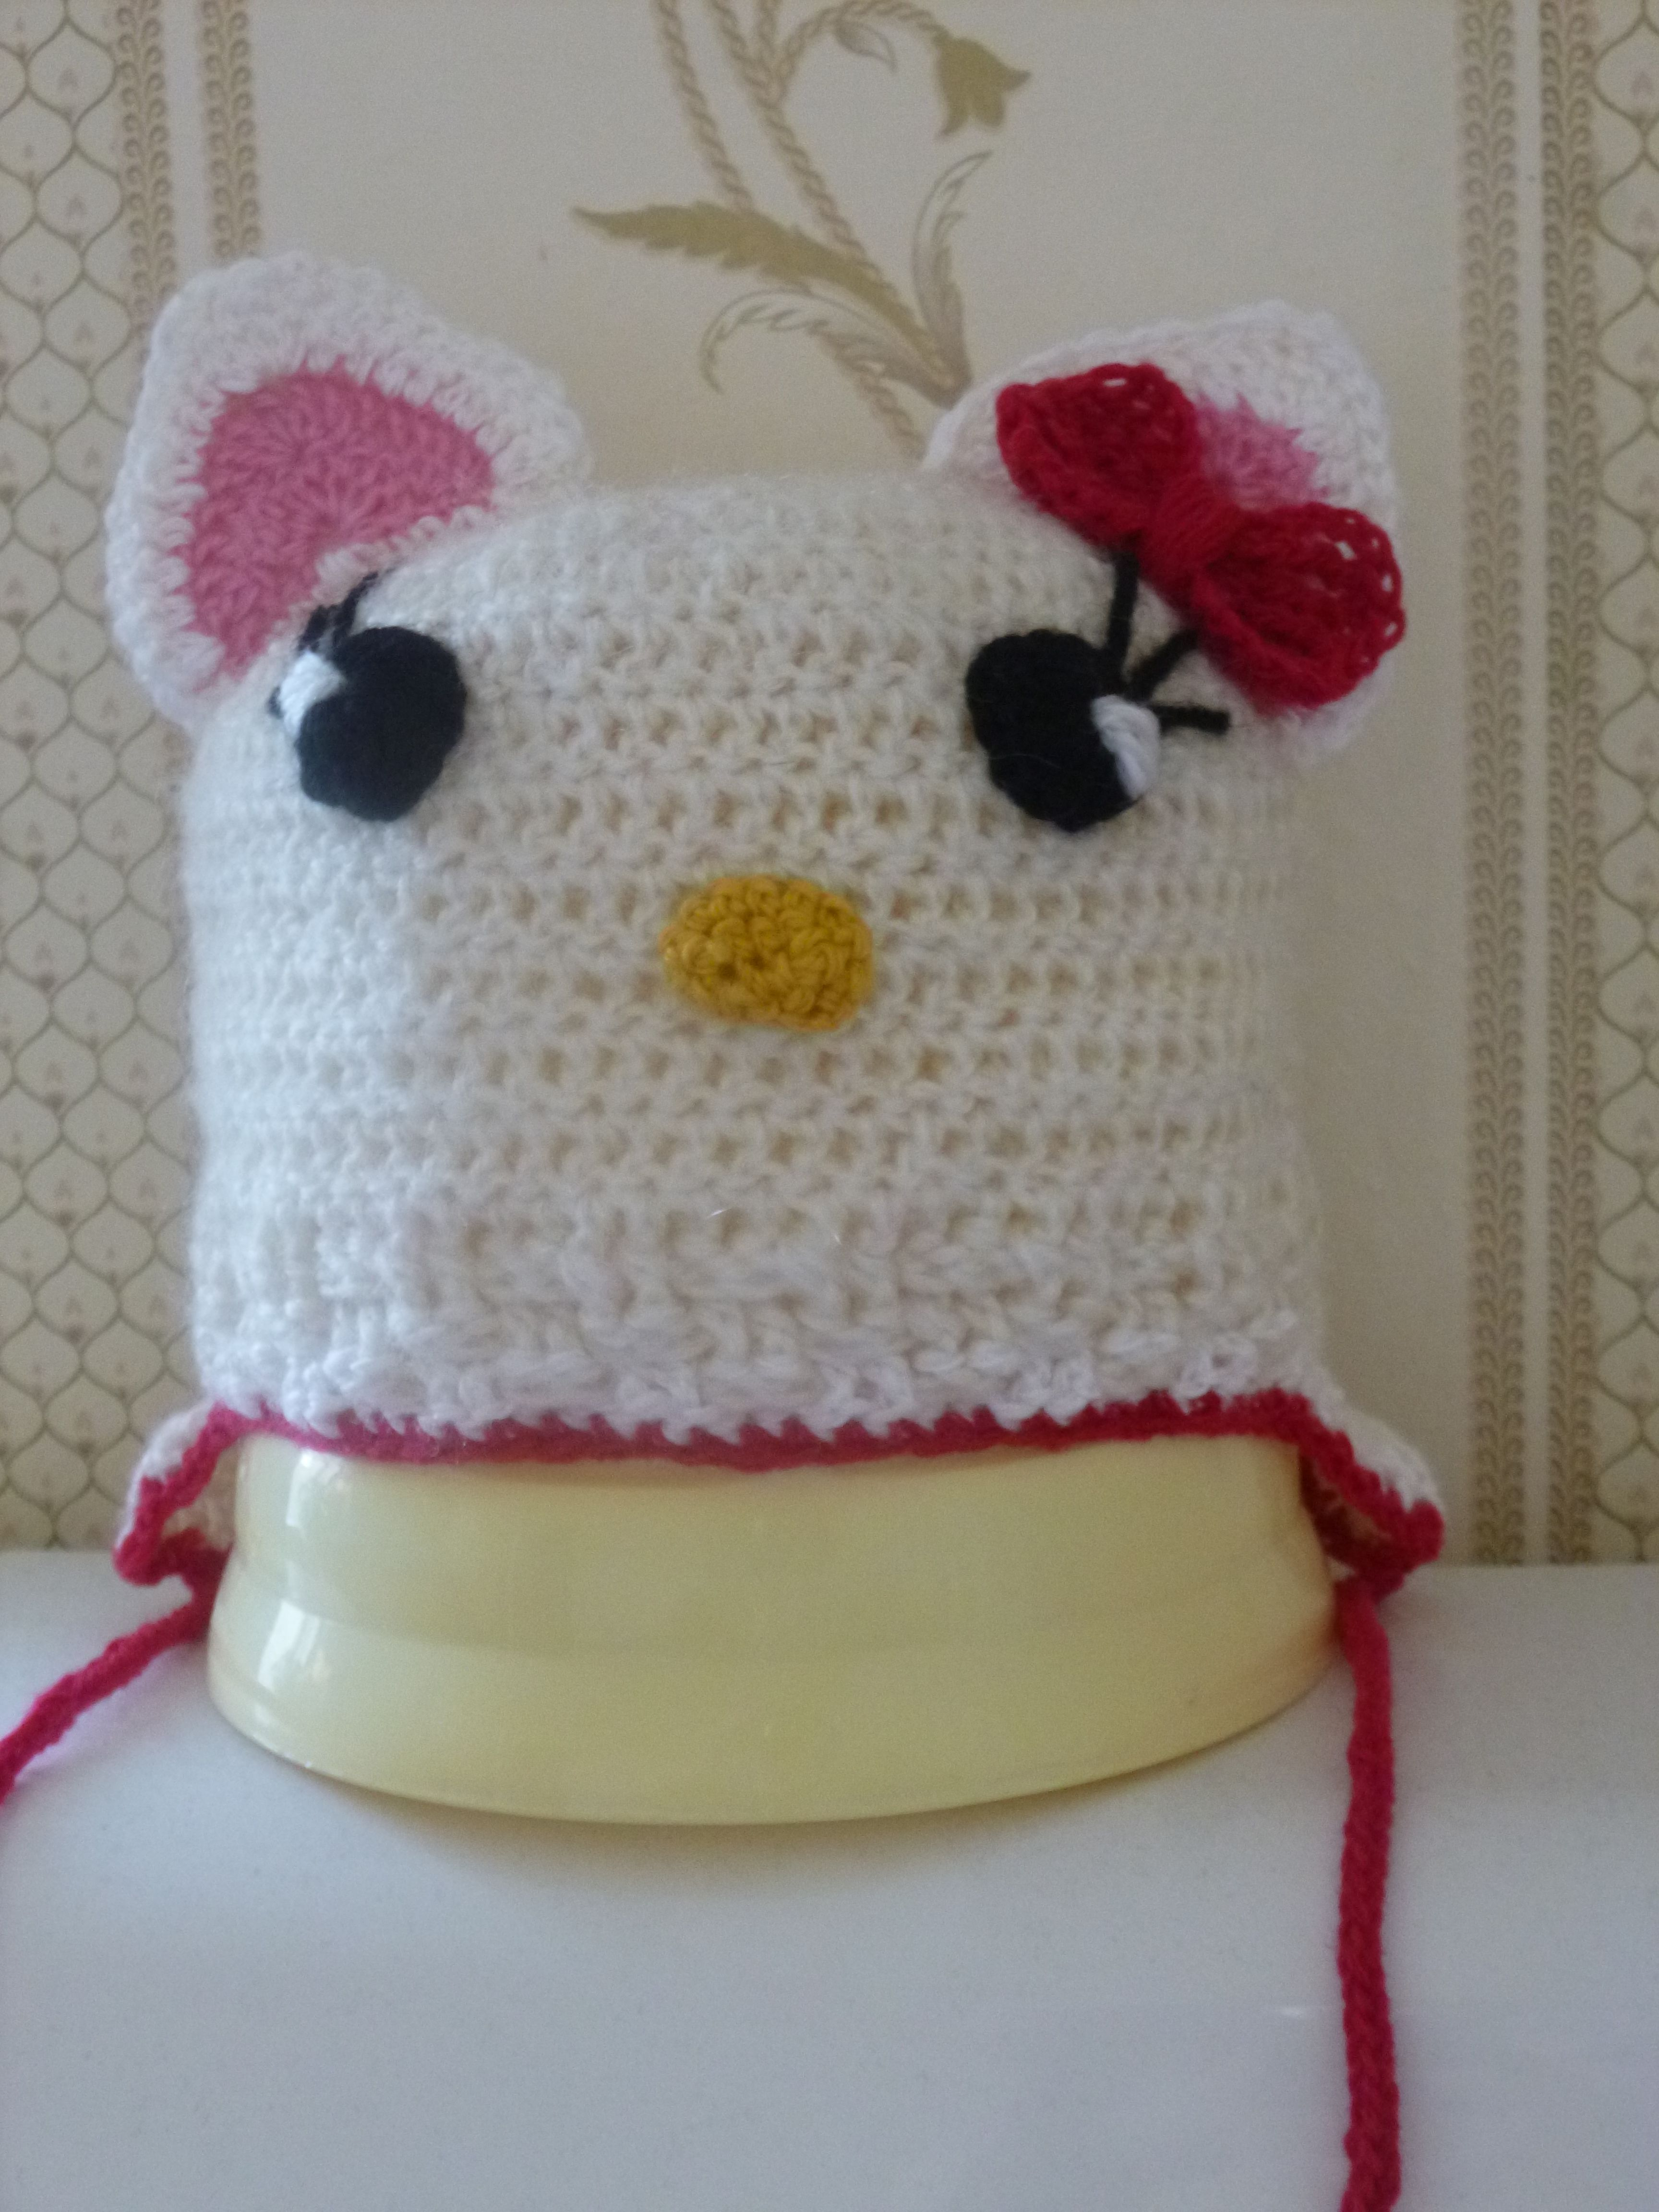 вязаная детская шапочка весенняя осенняя крючком шерсть демисезонная шапочкаhellokitty hello kitty зимняя акрил